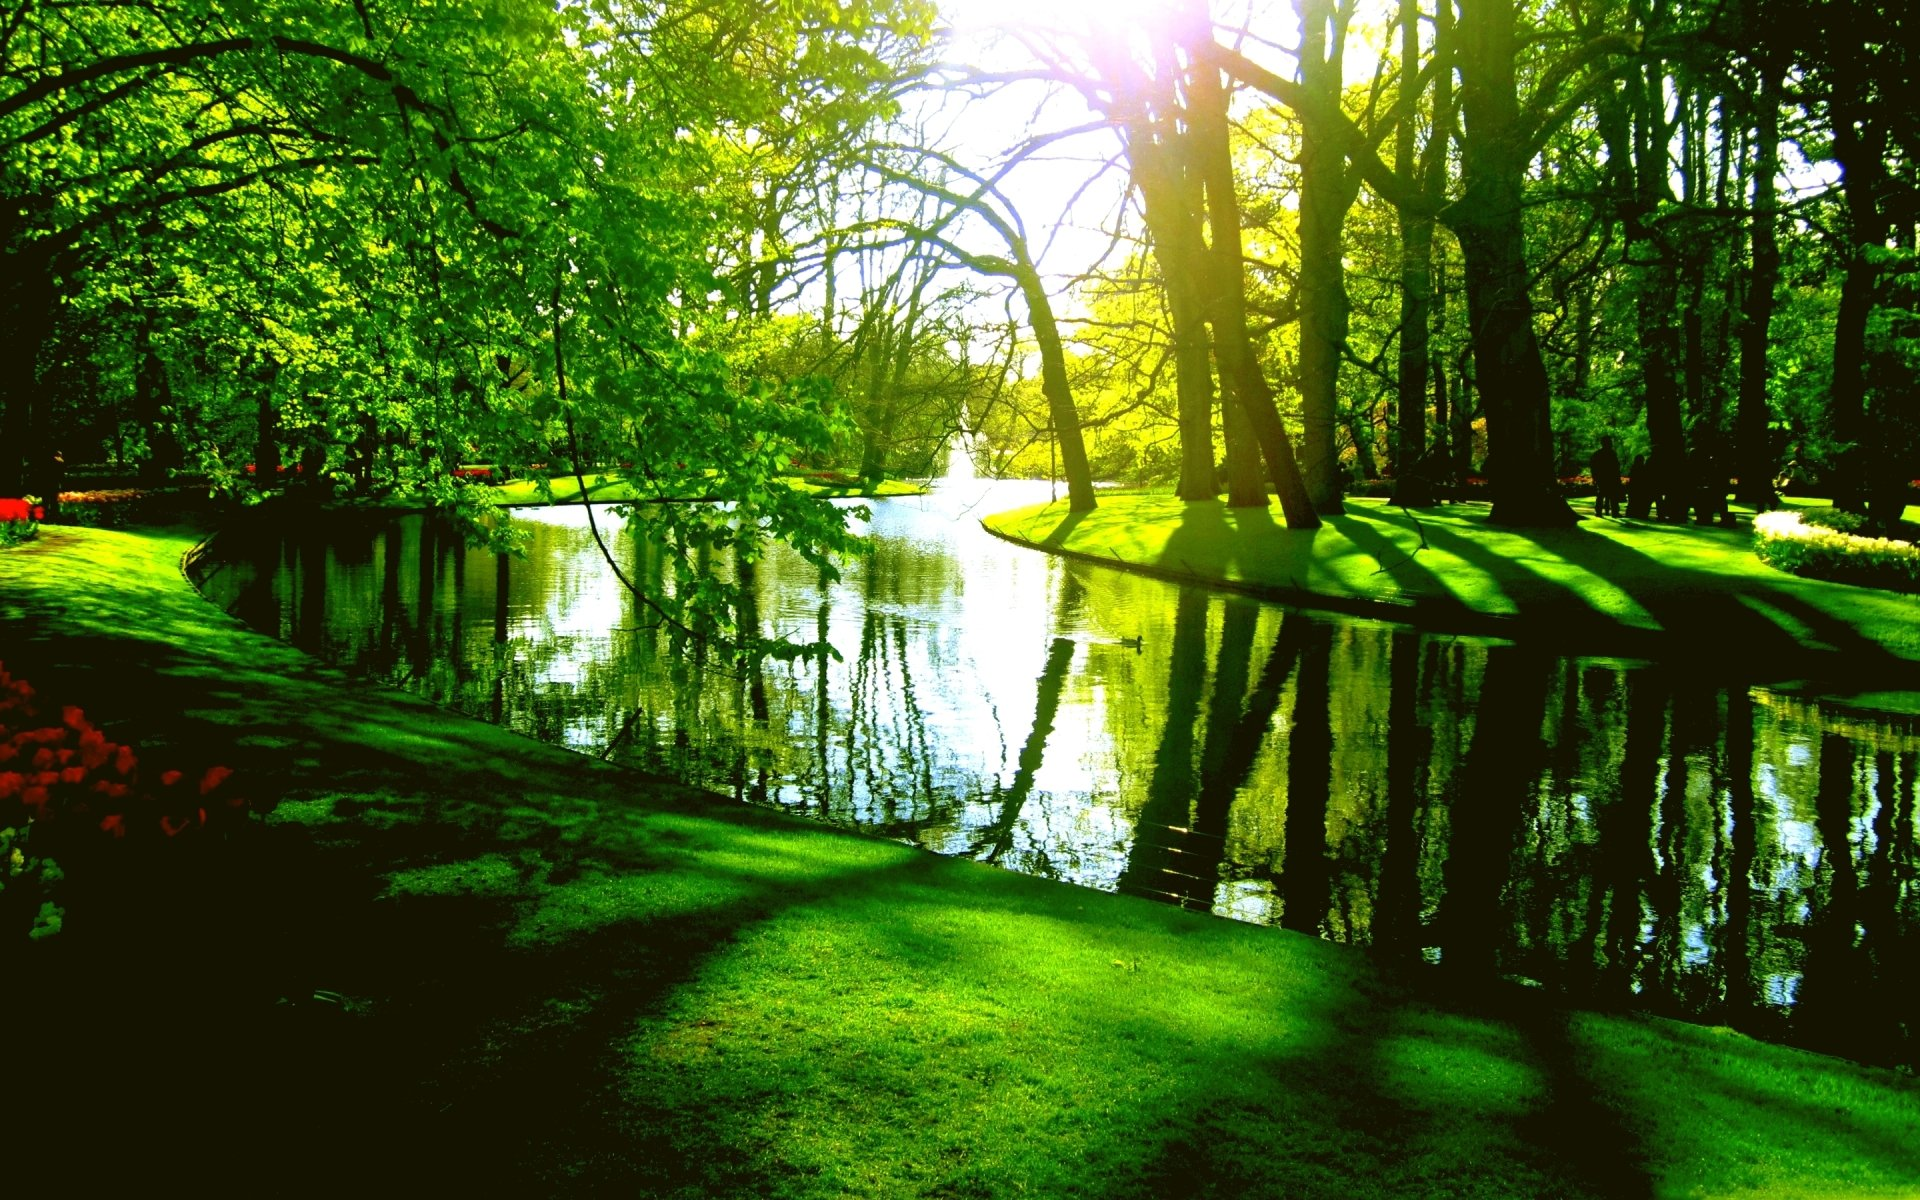 Green park in springtime hd wallpaper hintergrund - Green nature wallpaper full hd ...